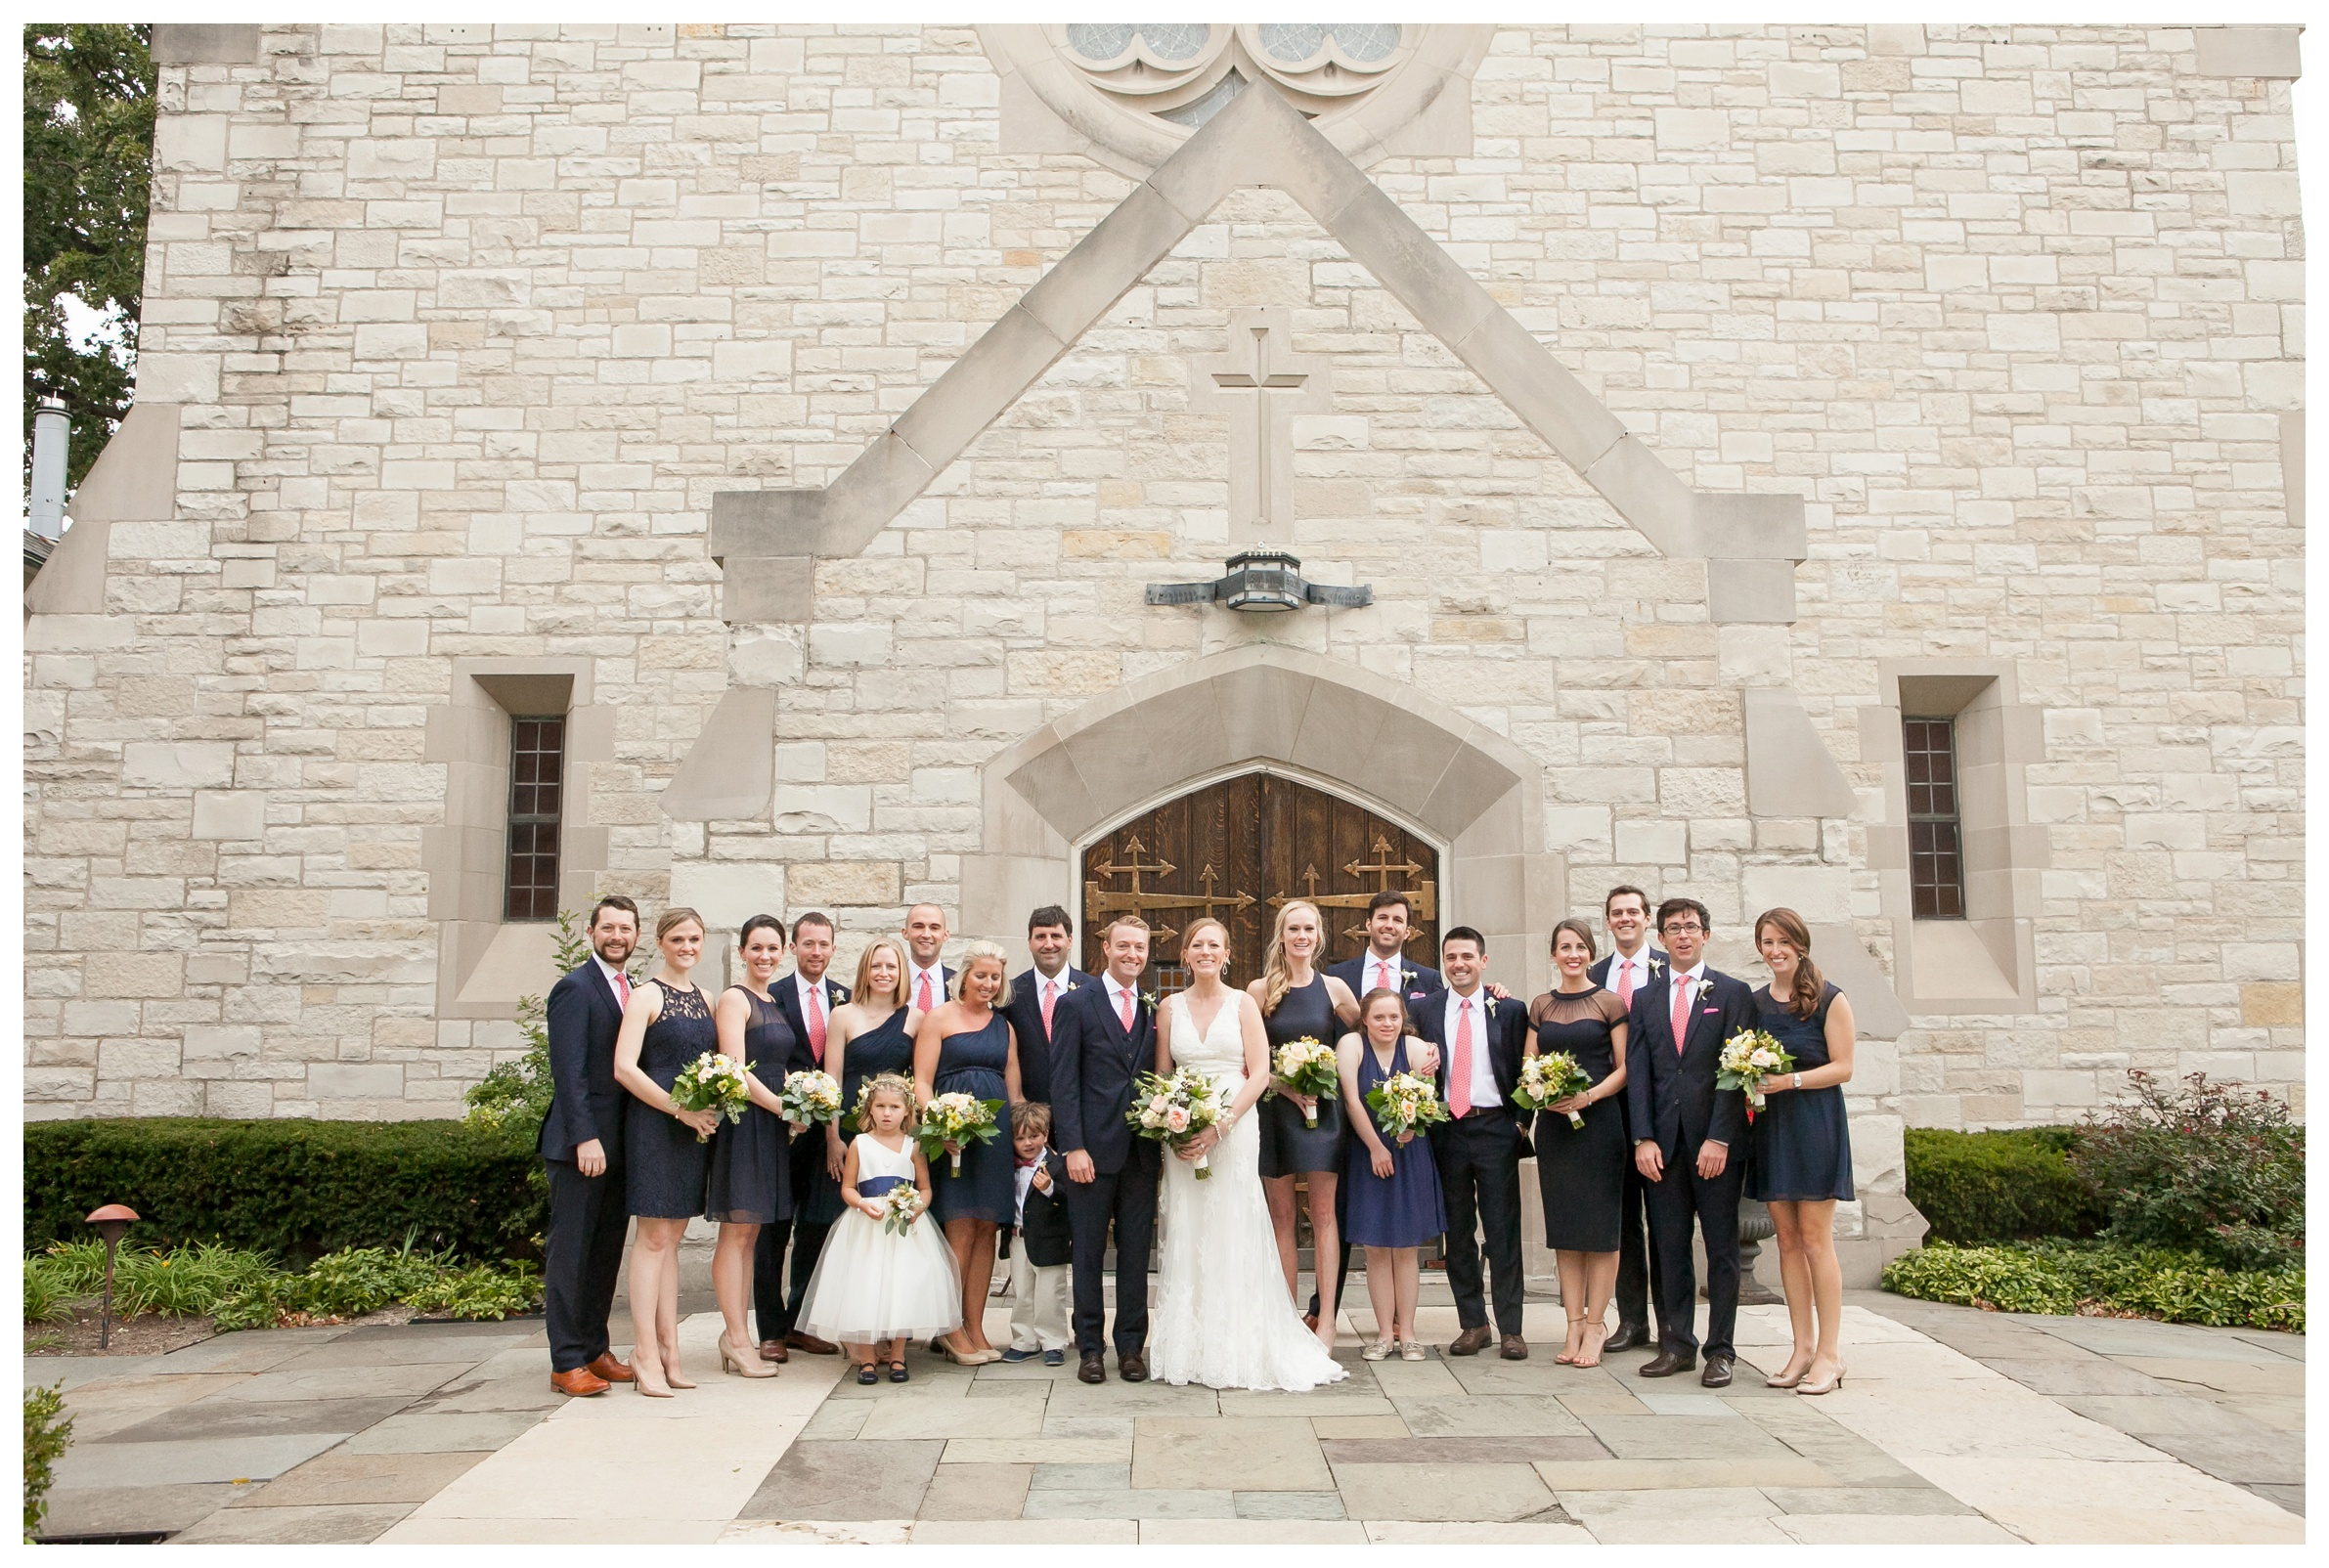 st-francis-xavier-wedding-photo